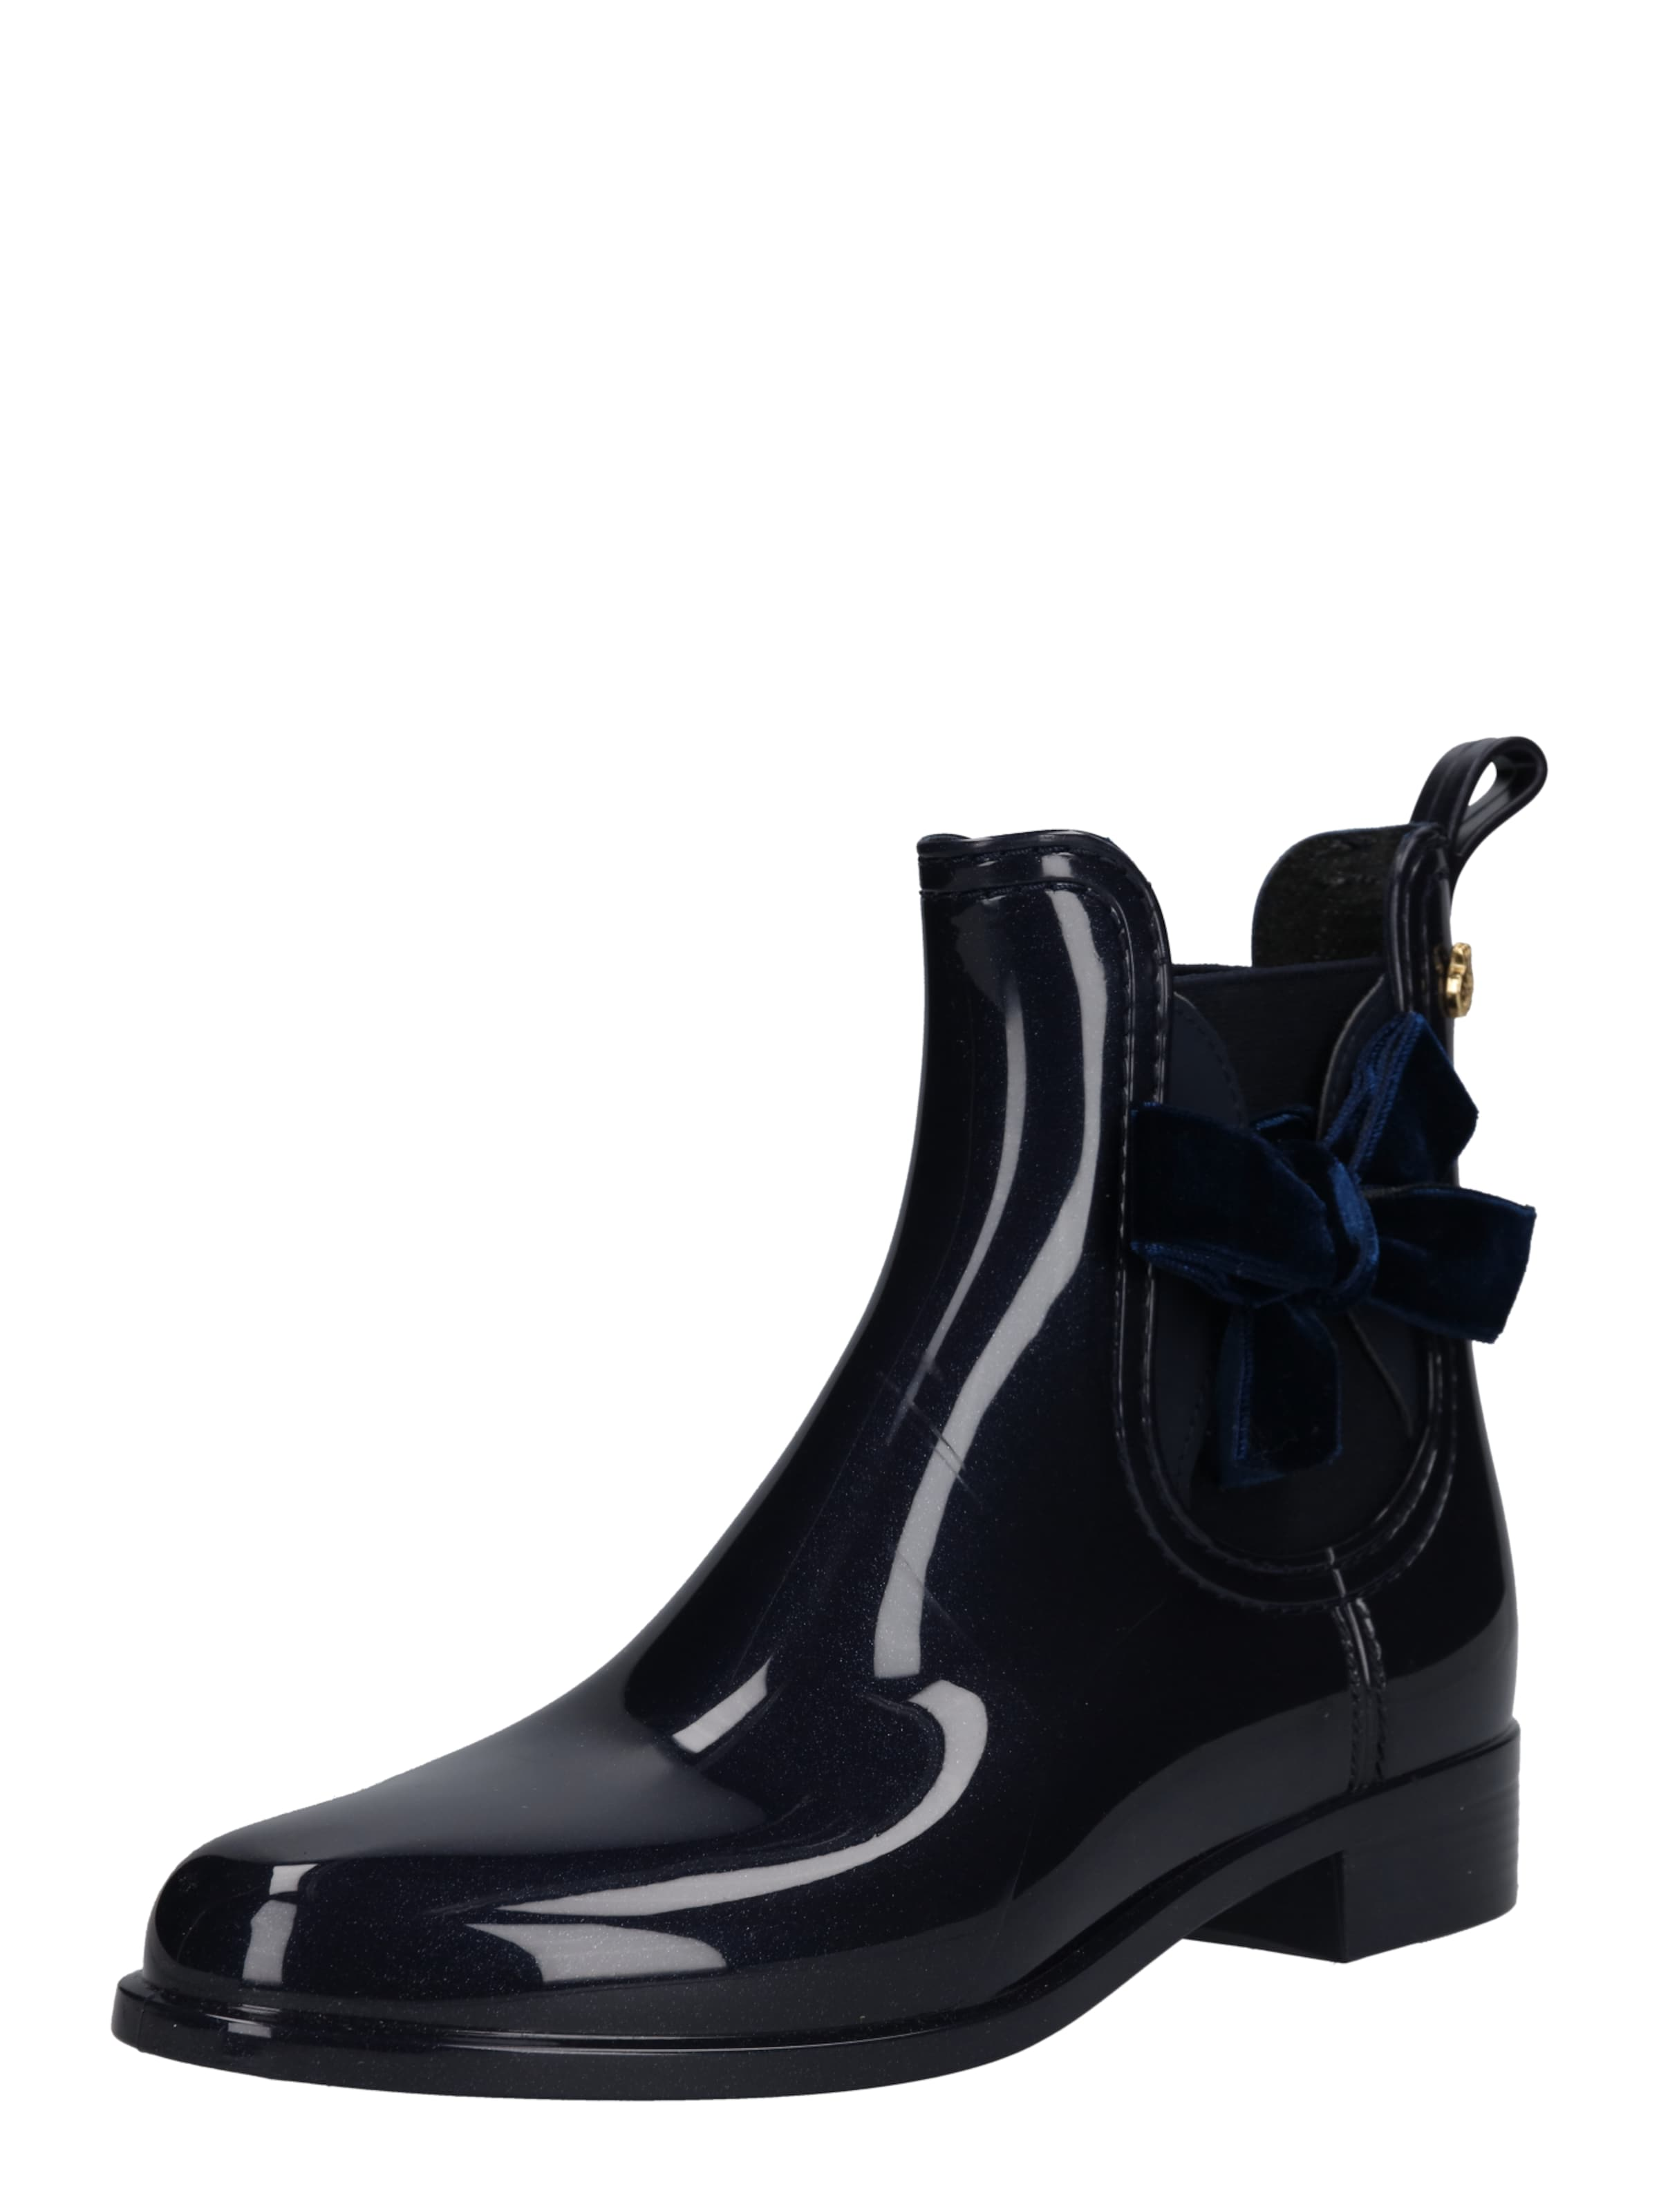 LEMON JELLY Gummistiefelette Verschleißfeste billige Schuhe